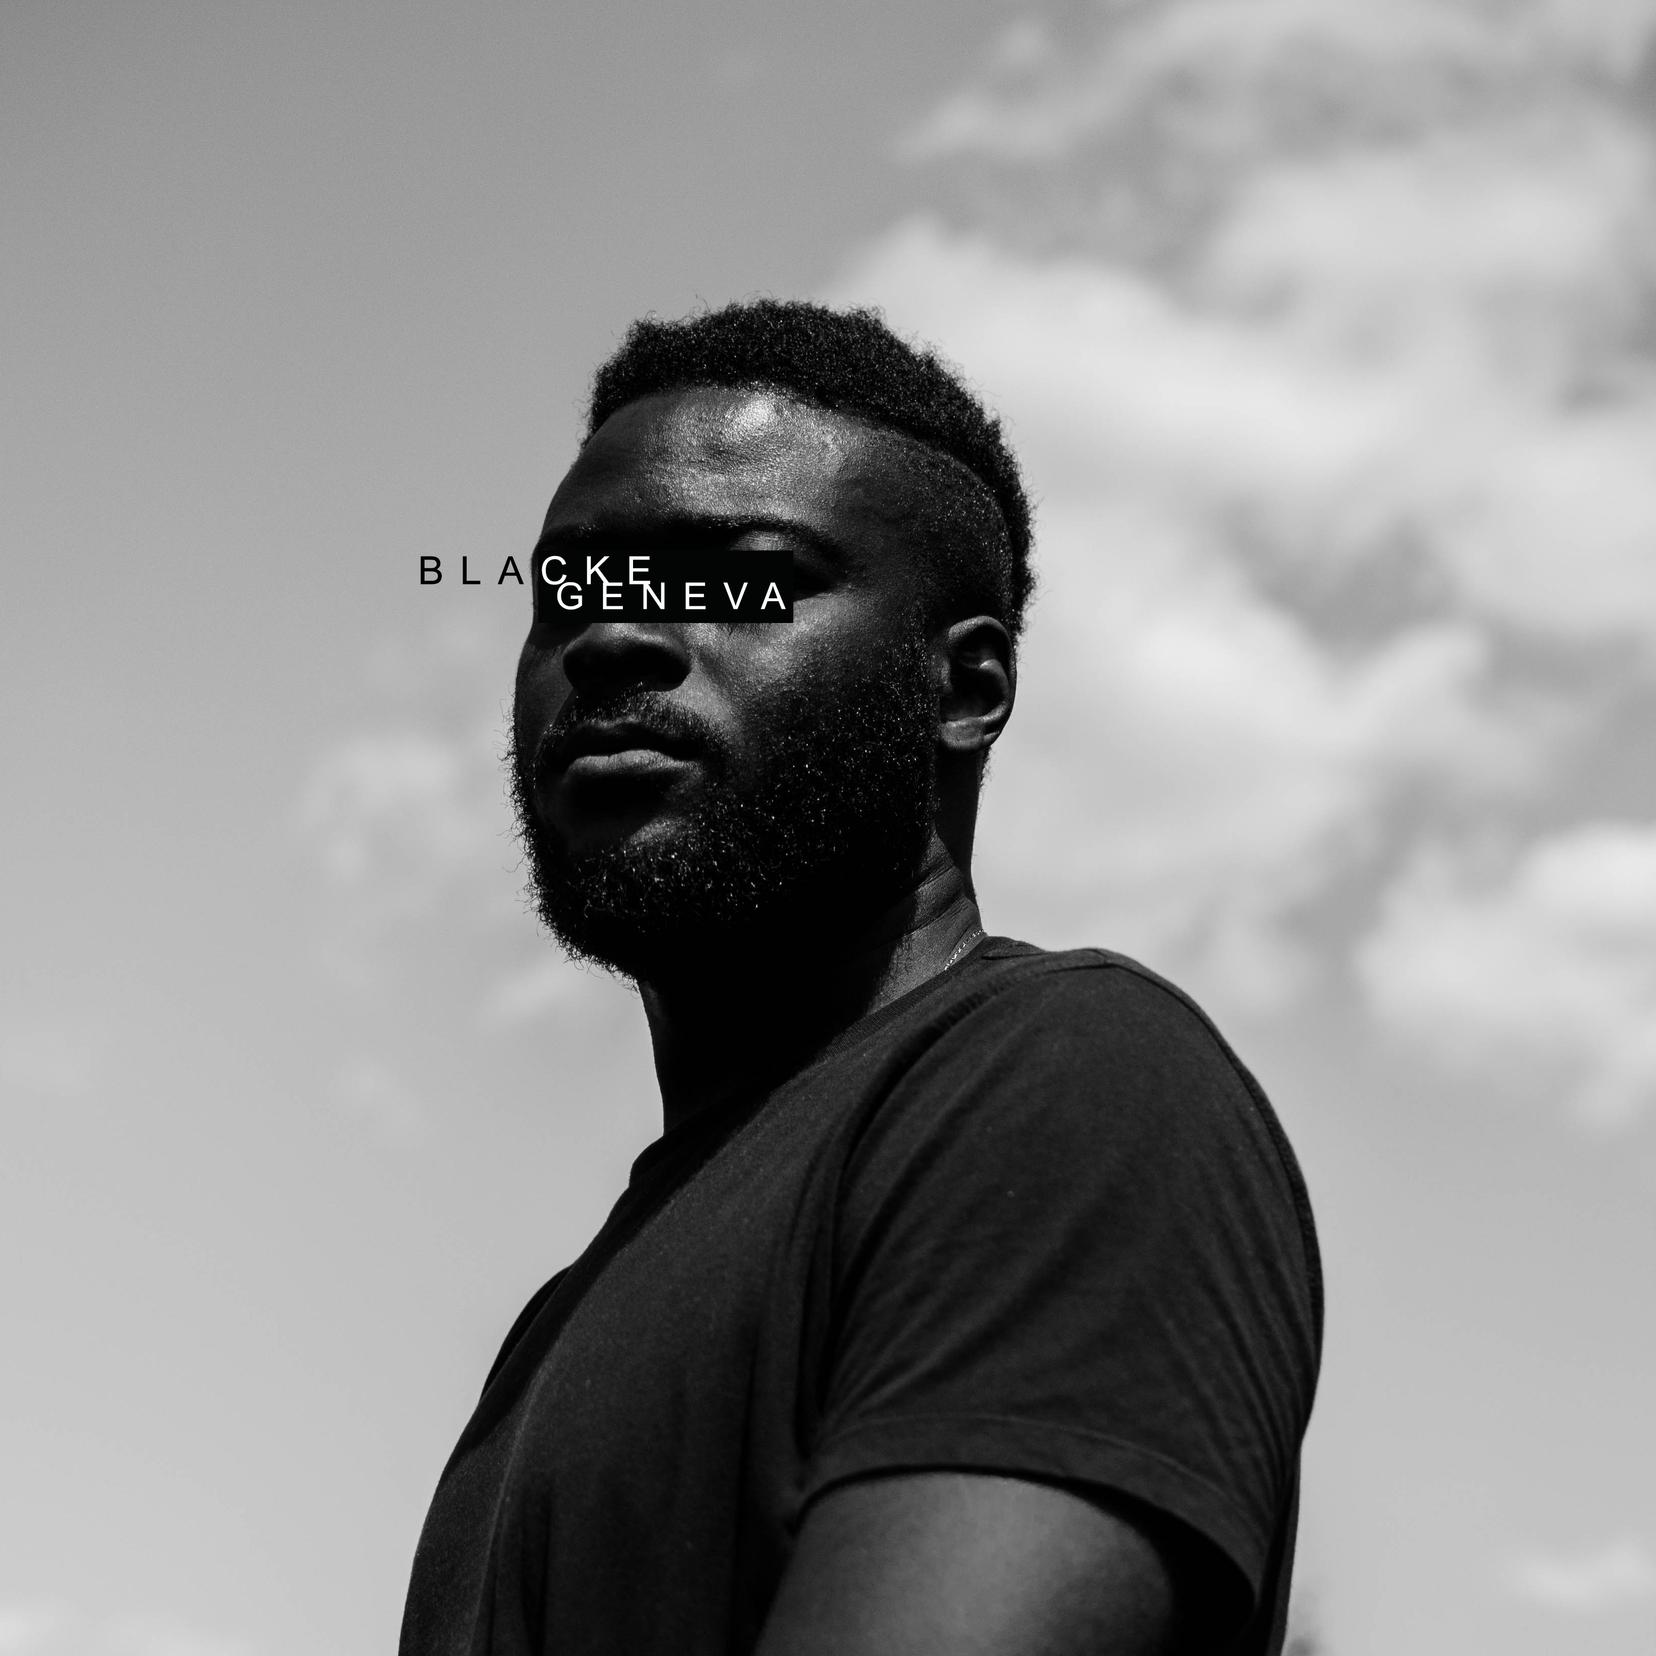 Blacke Geneva test album cover black&white close up